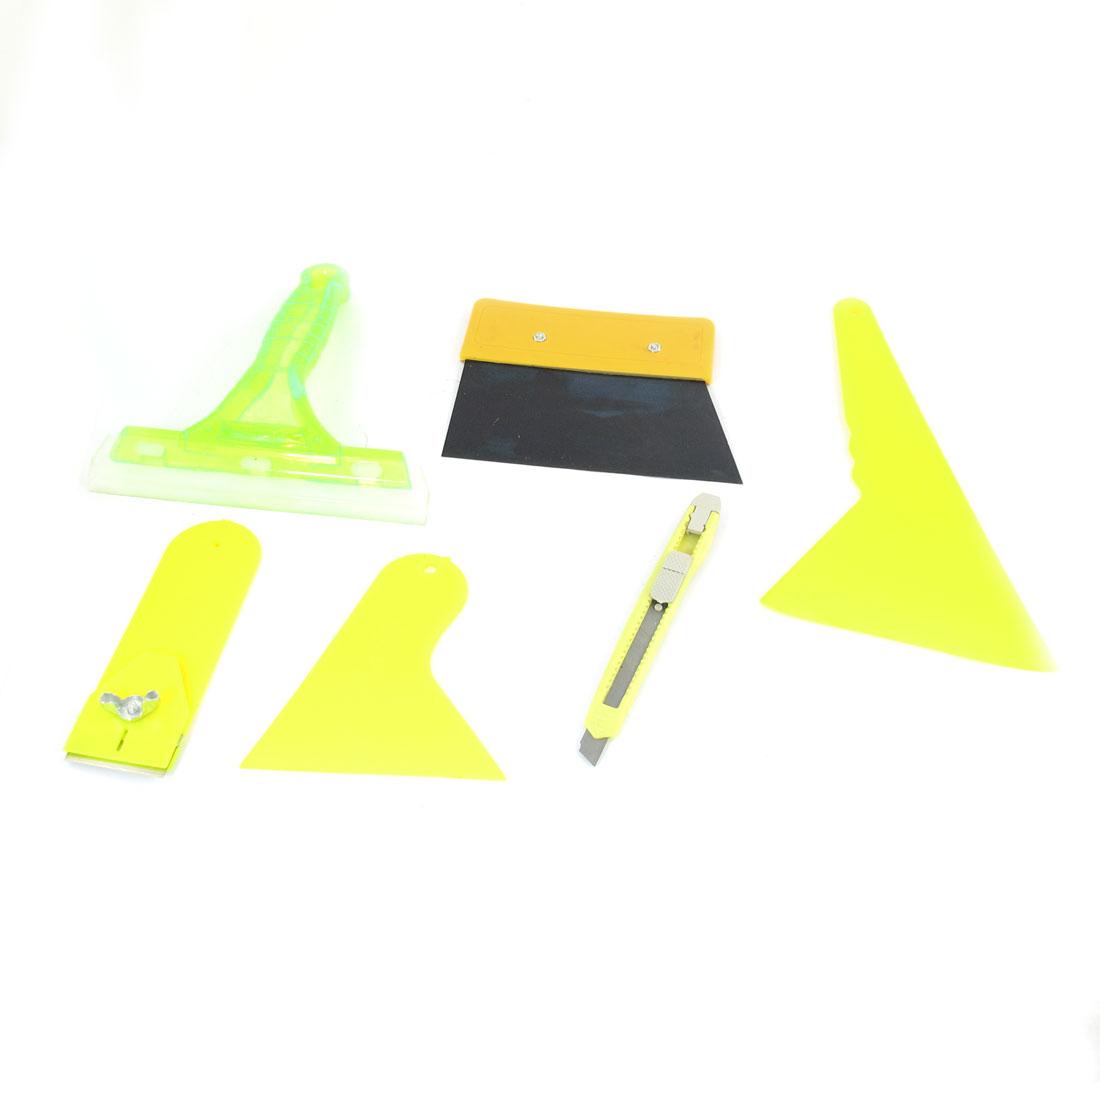 Vehicle Auto Window Film Bubble Scraper Yellow Handle Wiper Tool Set 6 in 1